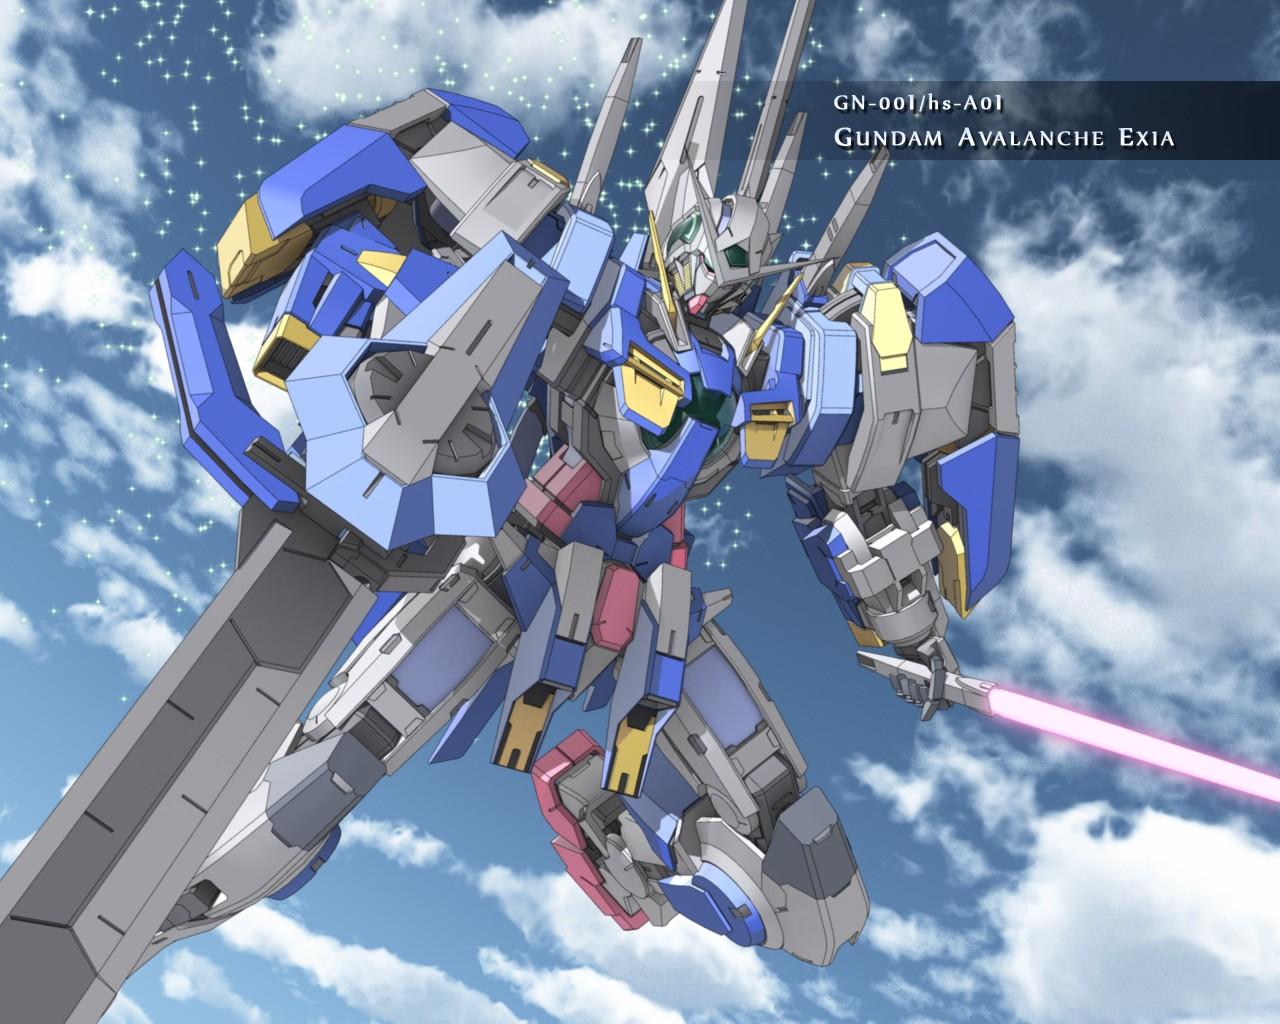 Gundam Avalanche Exia   Gundam Wallpaper 25015972 1280x1024